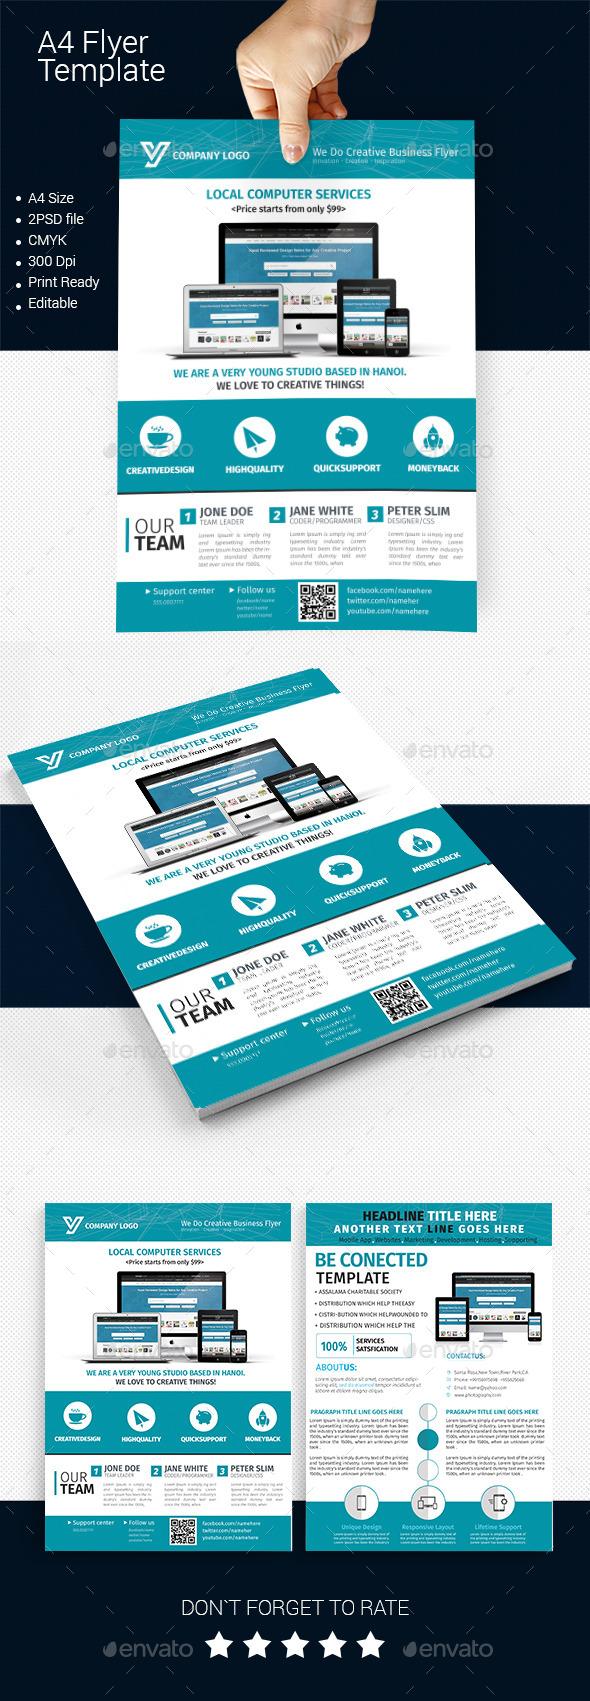 A4 Business Flyer Template 02